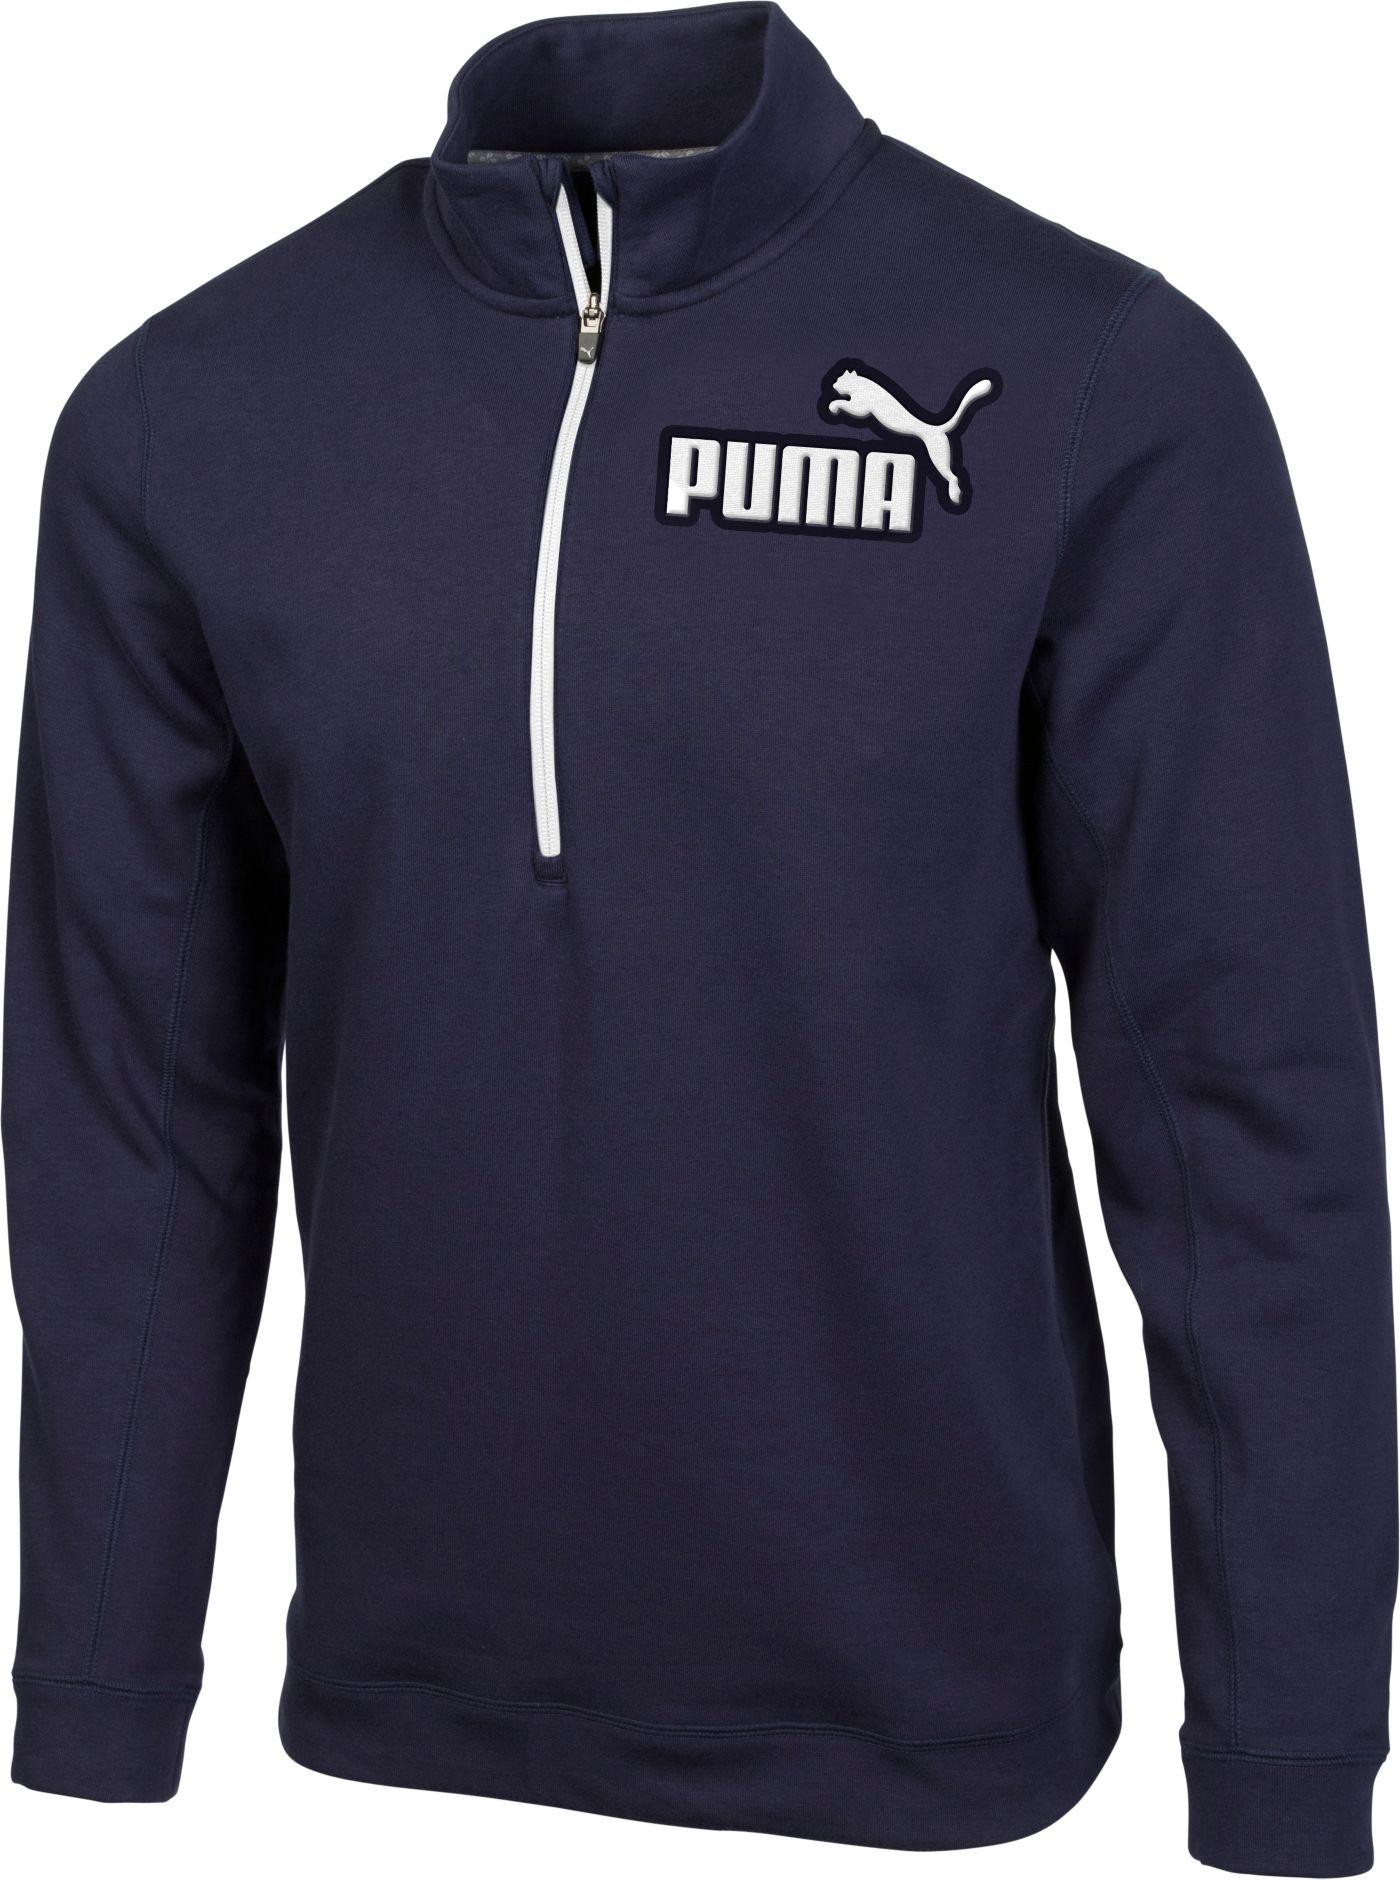 PUMA Men's Logo 1/4 Zip Golf Jacket